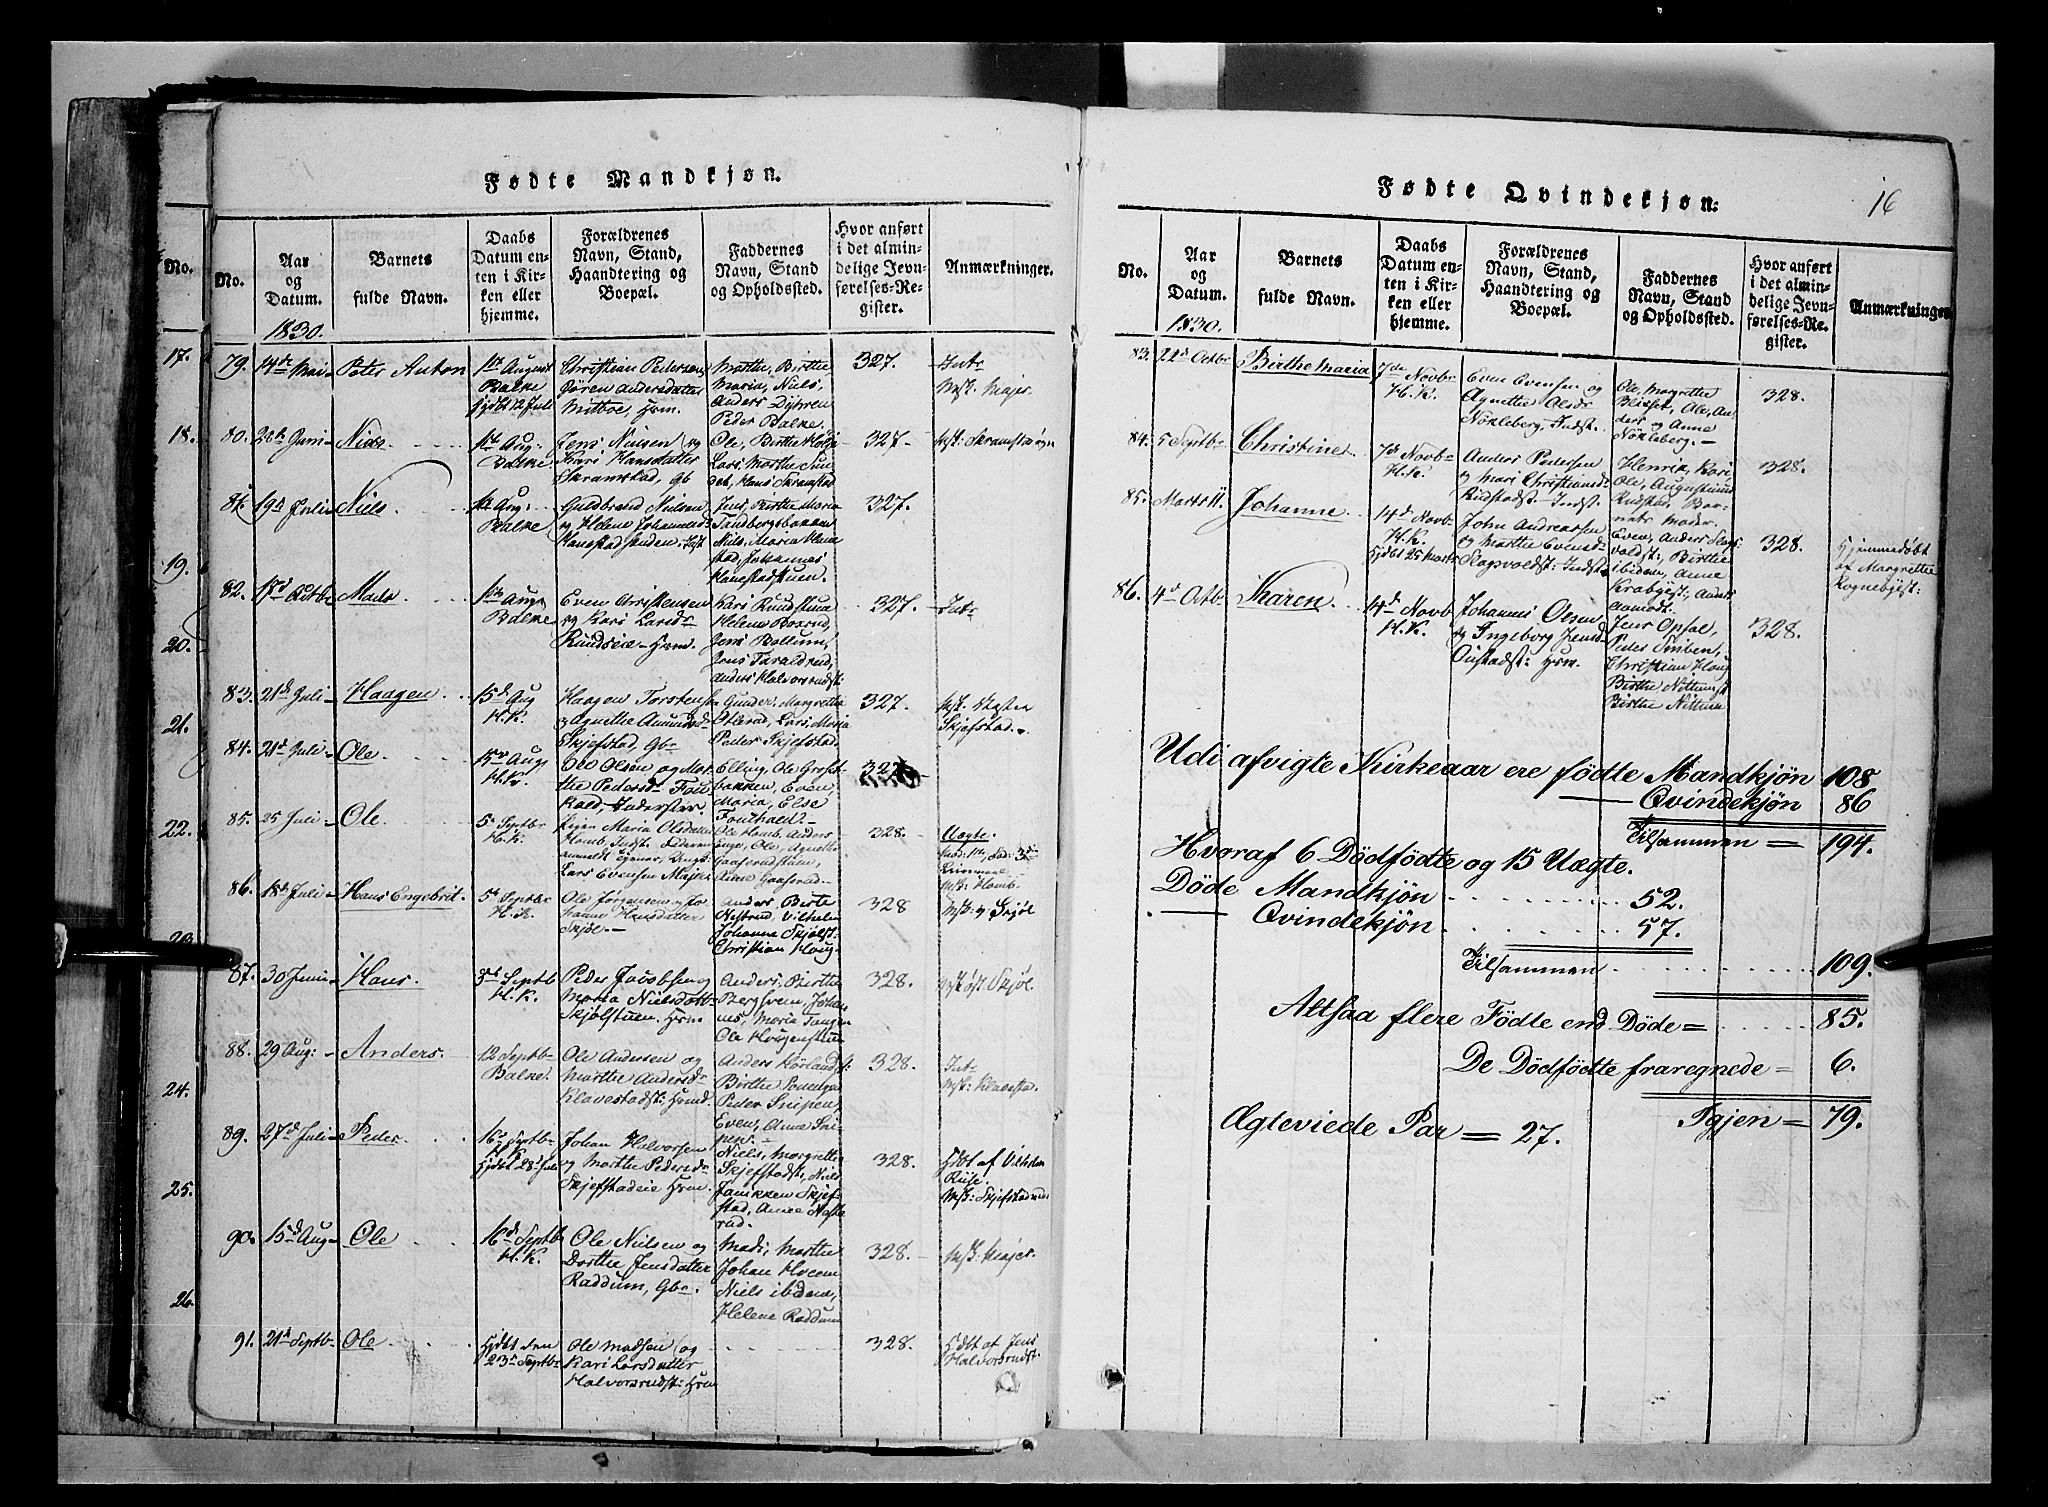 SAH, Østre Toten prestekontor, Ministerialbok nr. 1, 1828-1839, s. 16